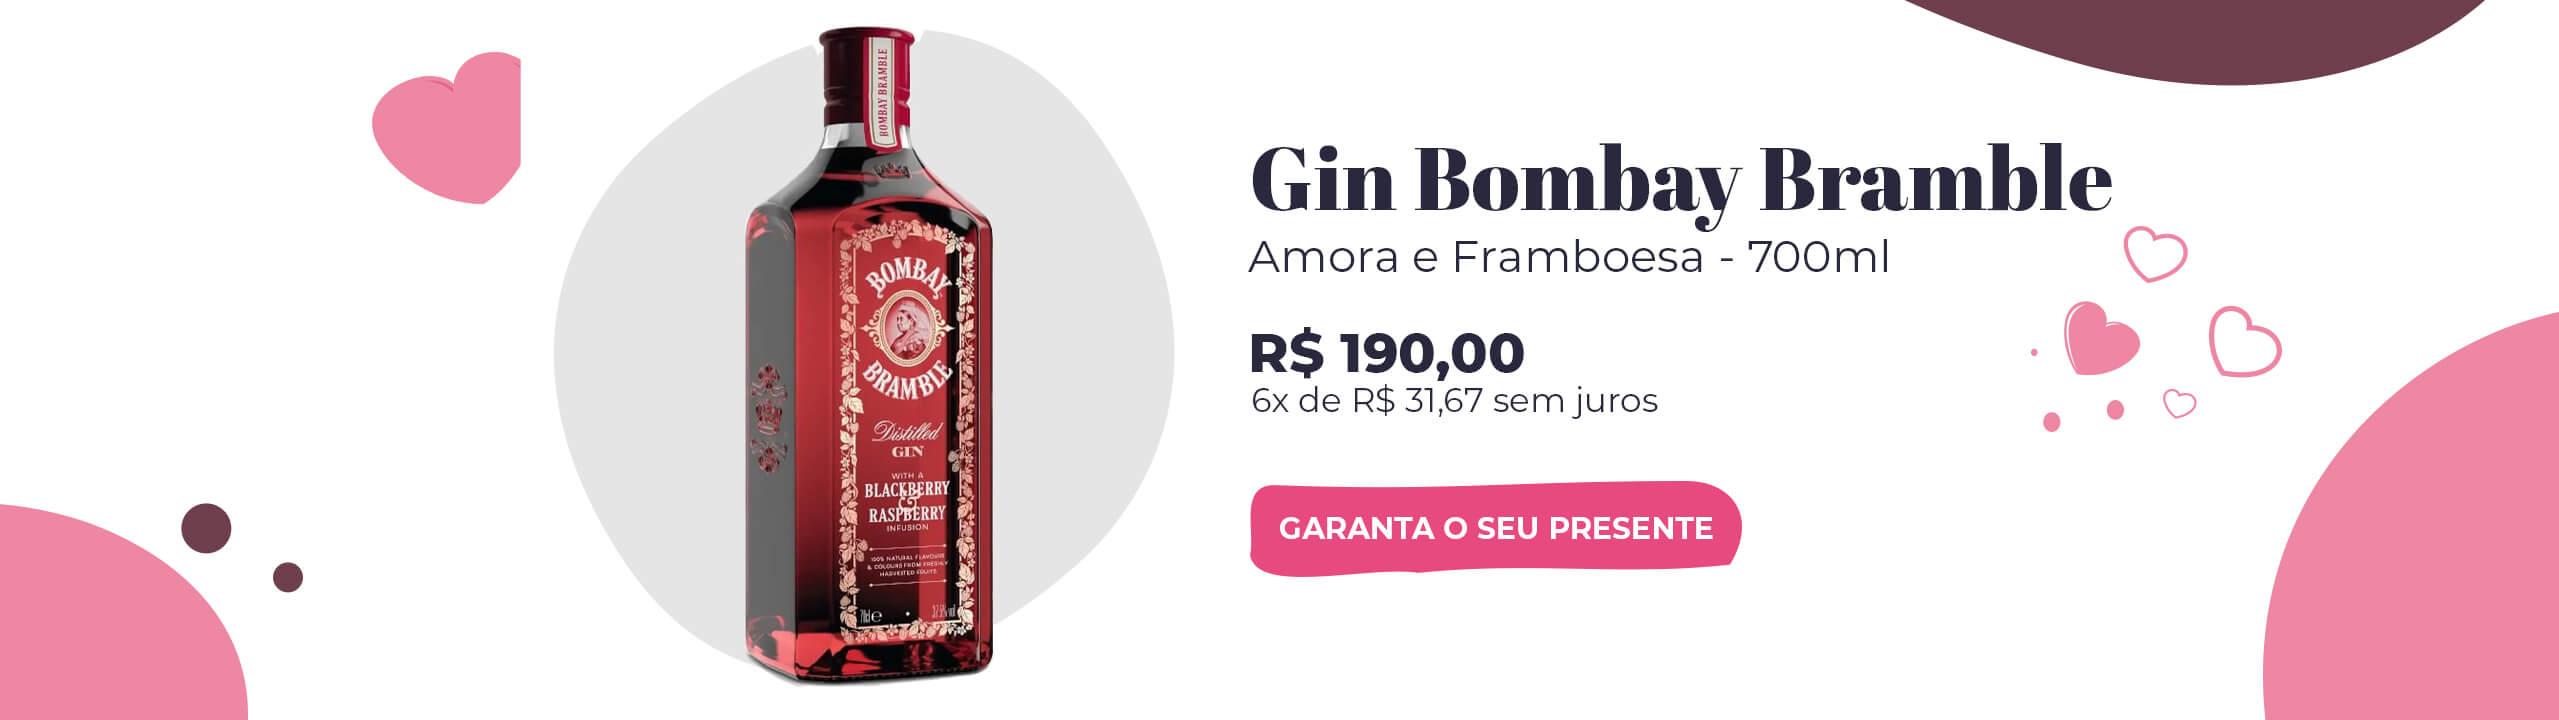 Gin Bombay Bramble 700ml Bartender Store